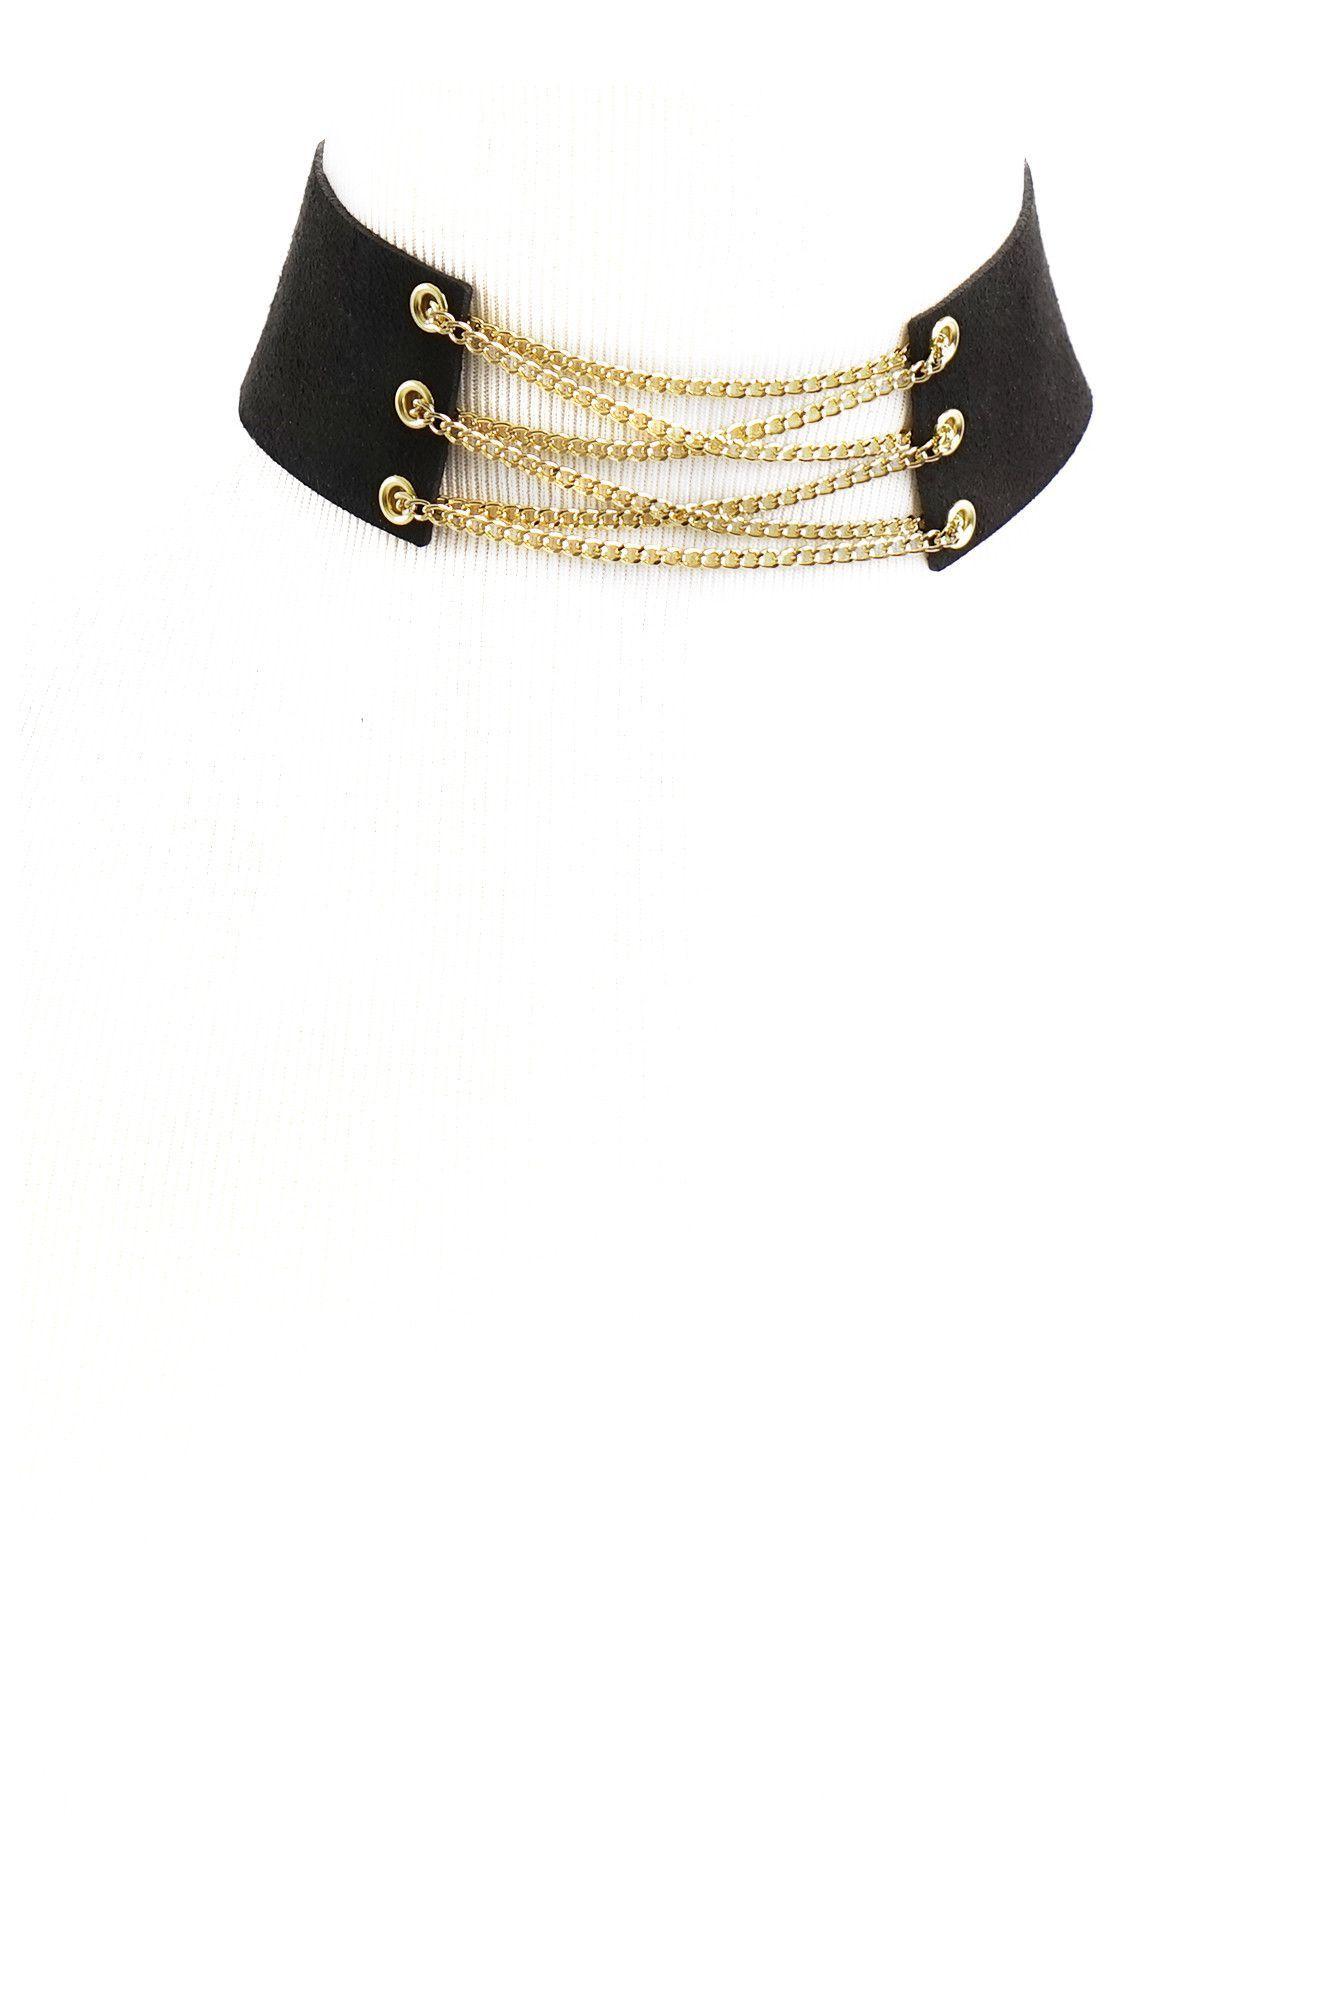 Gold Chain Black Corset Choker